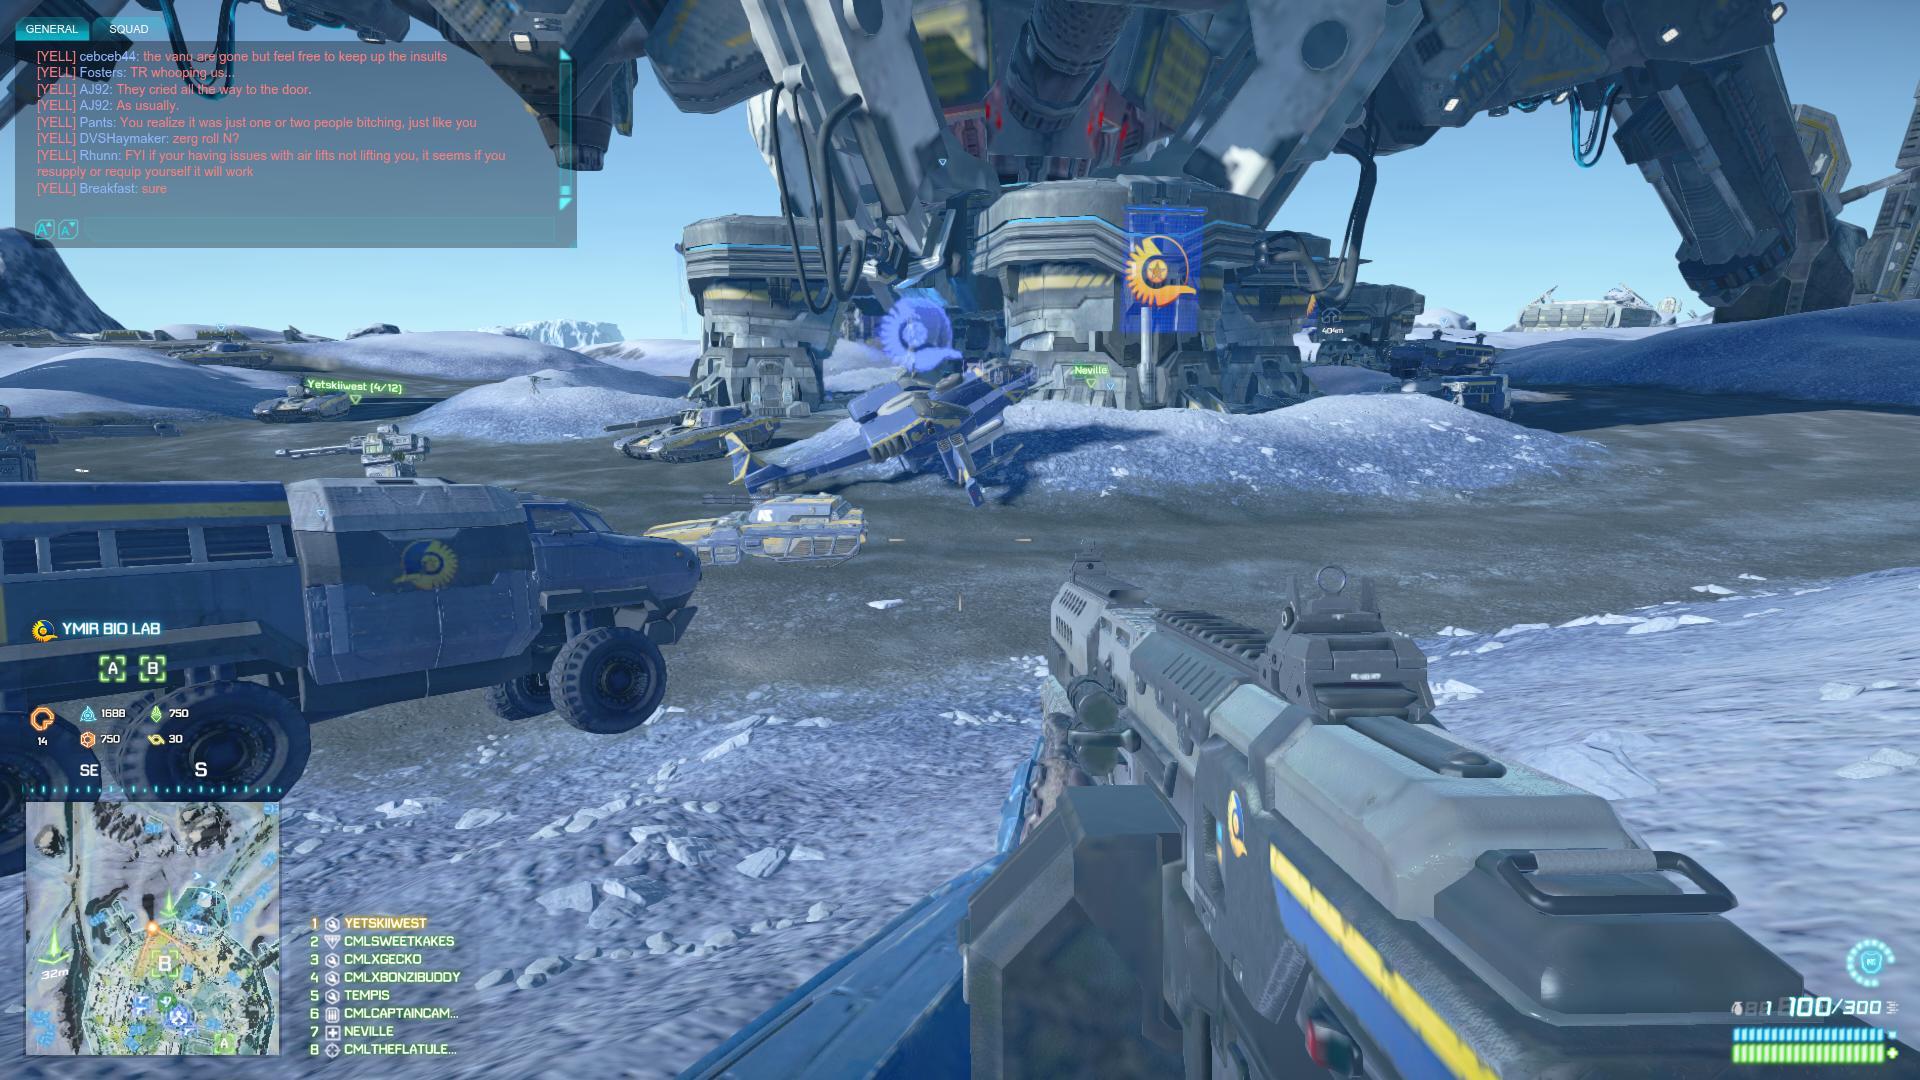 PlanetSide2 Large-Scale Combat